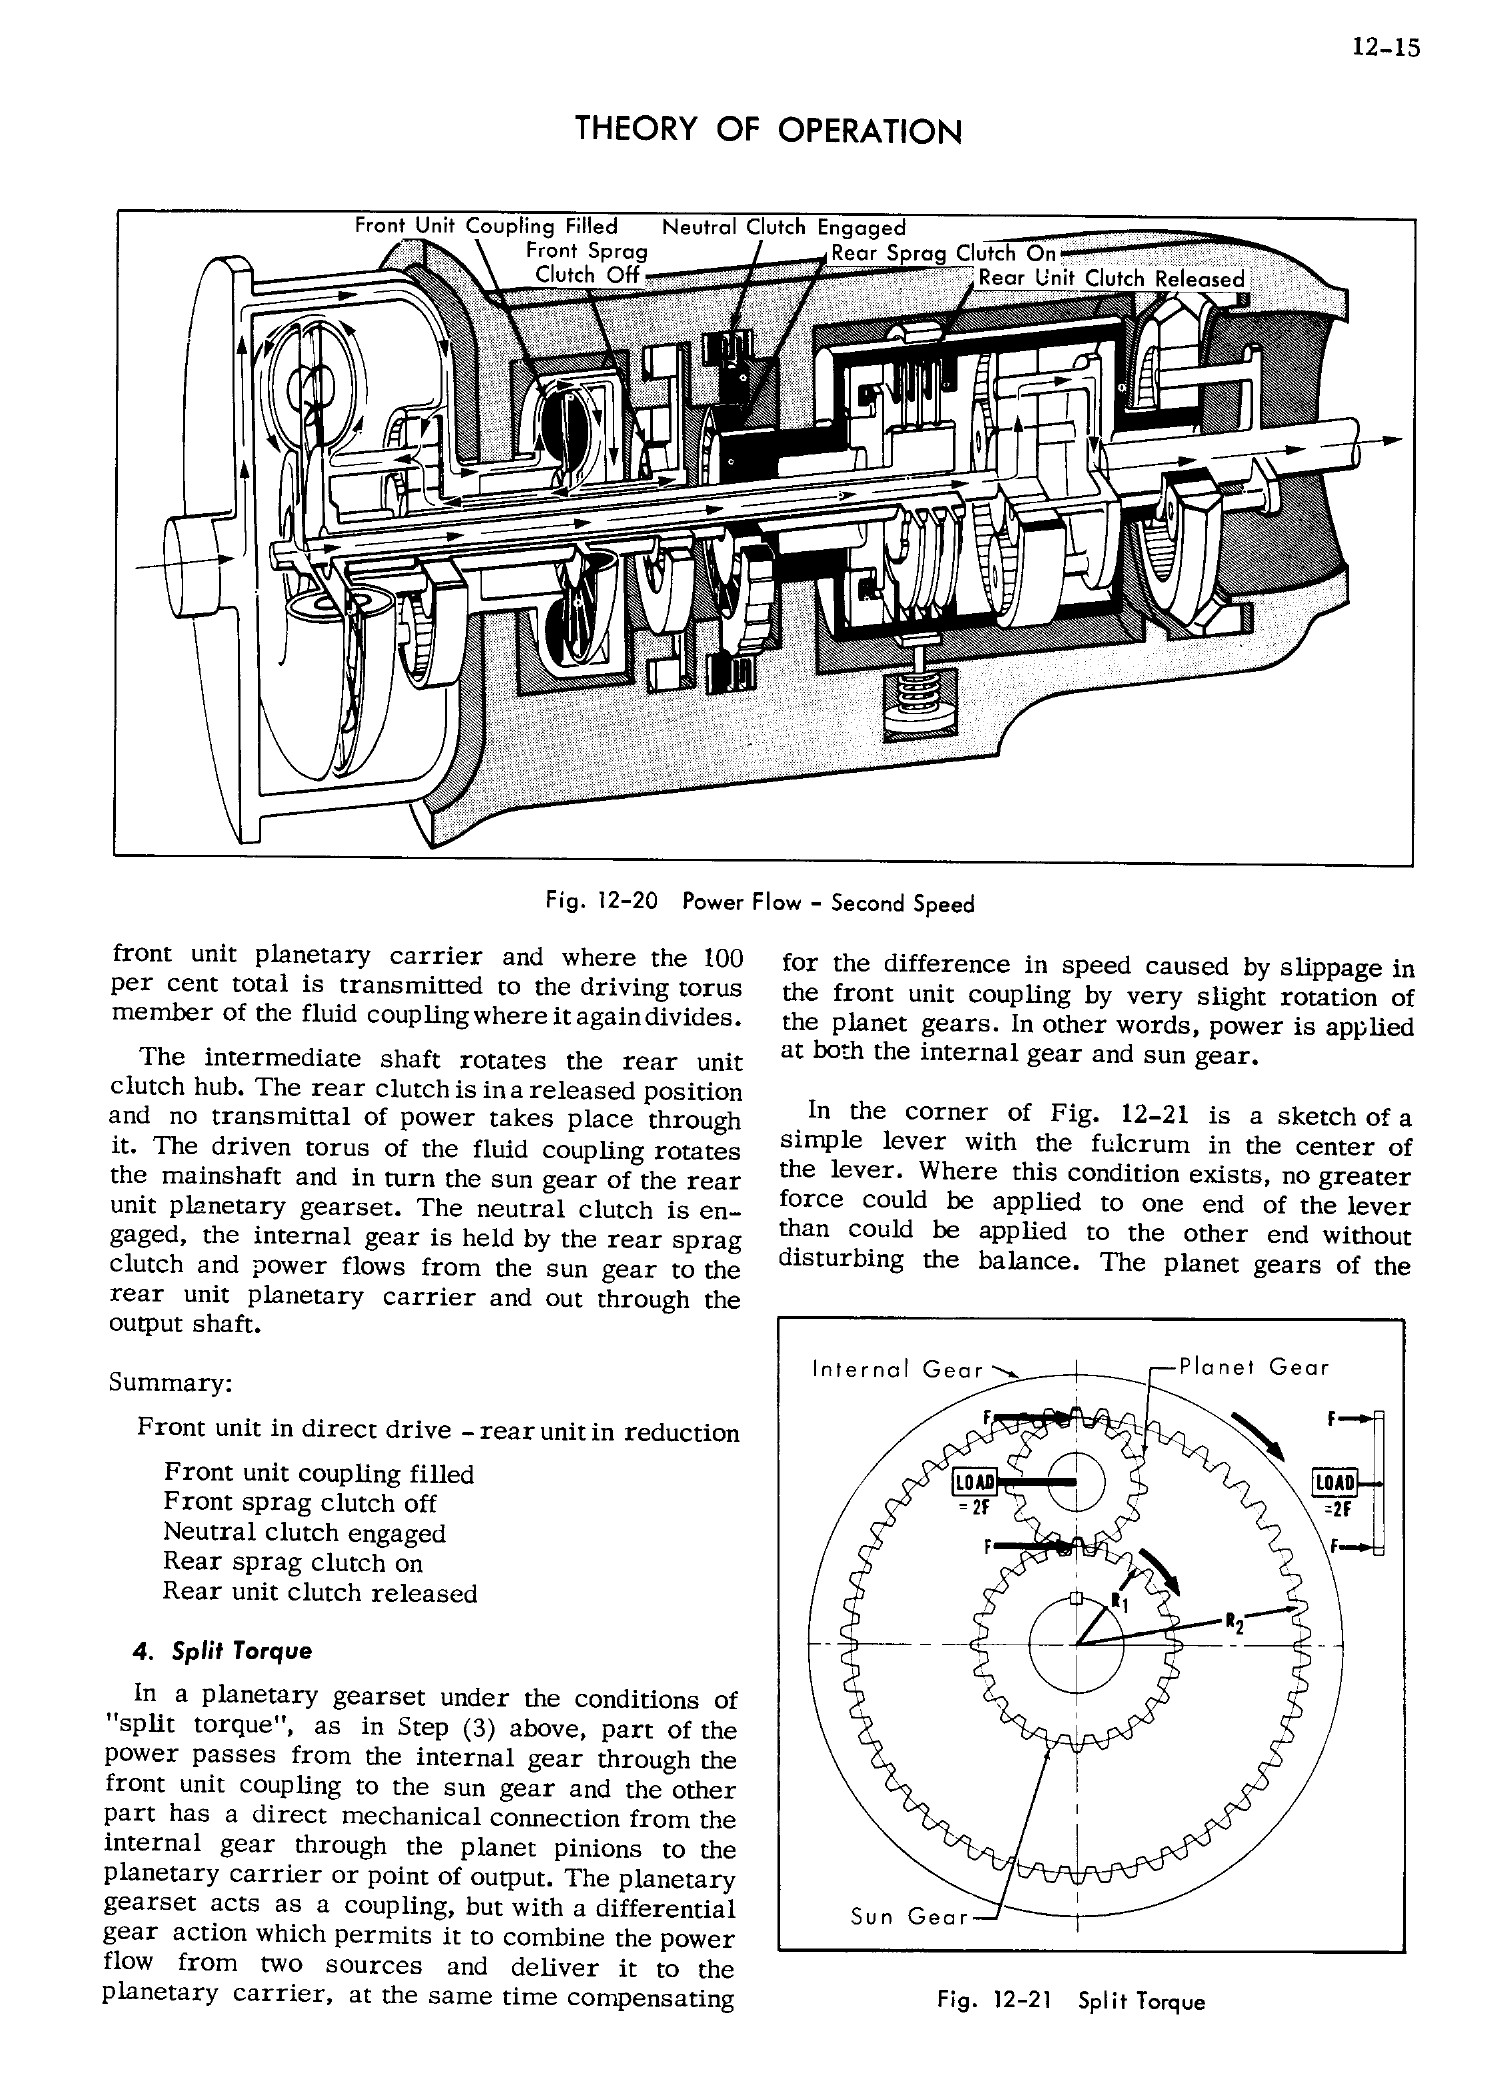 1956 Cadillac Shop Manual- Hydra-Matic Page 15 of 94